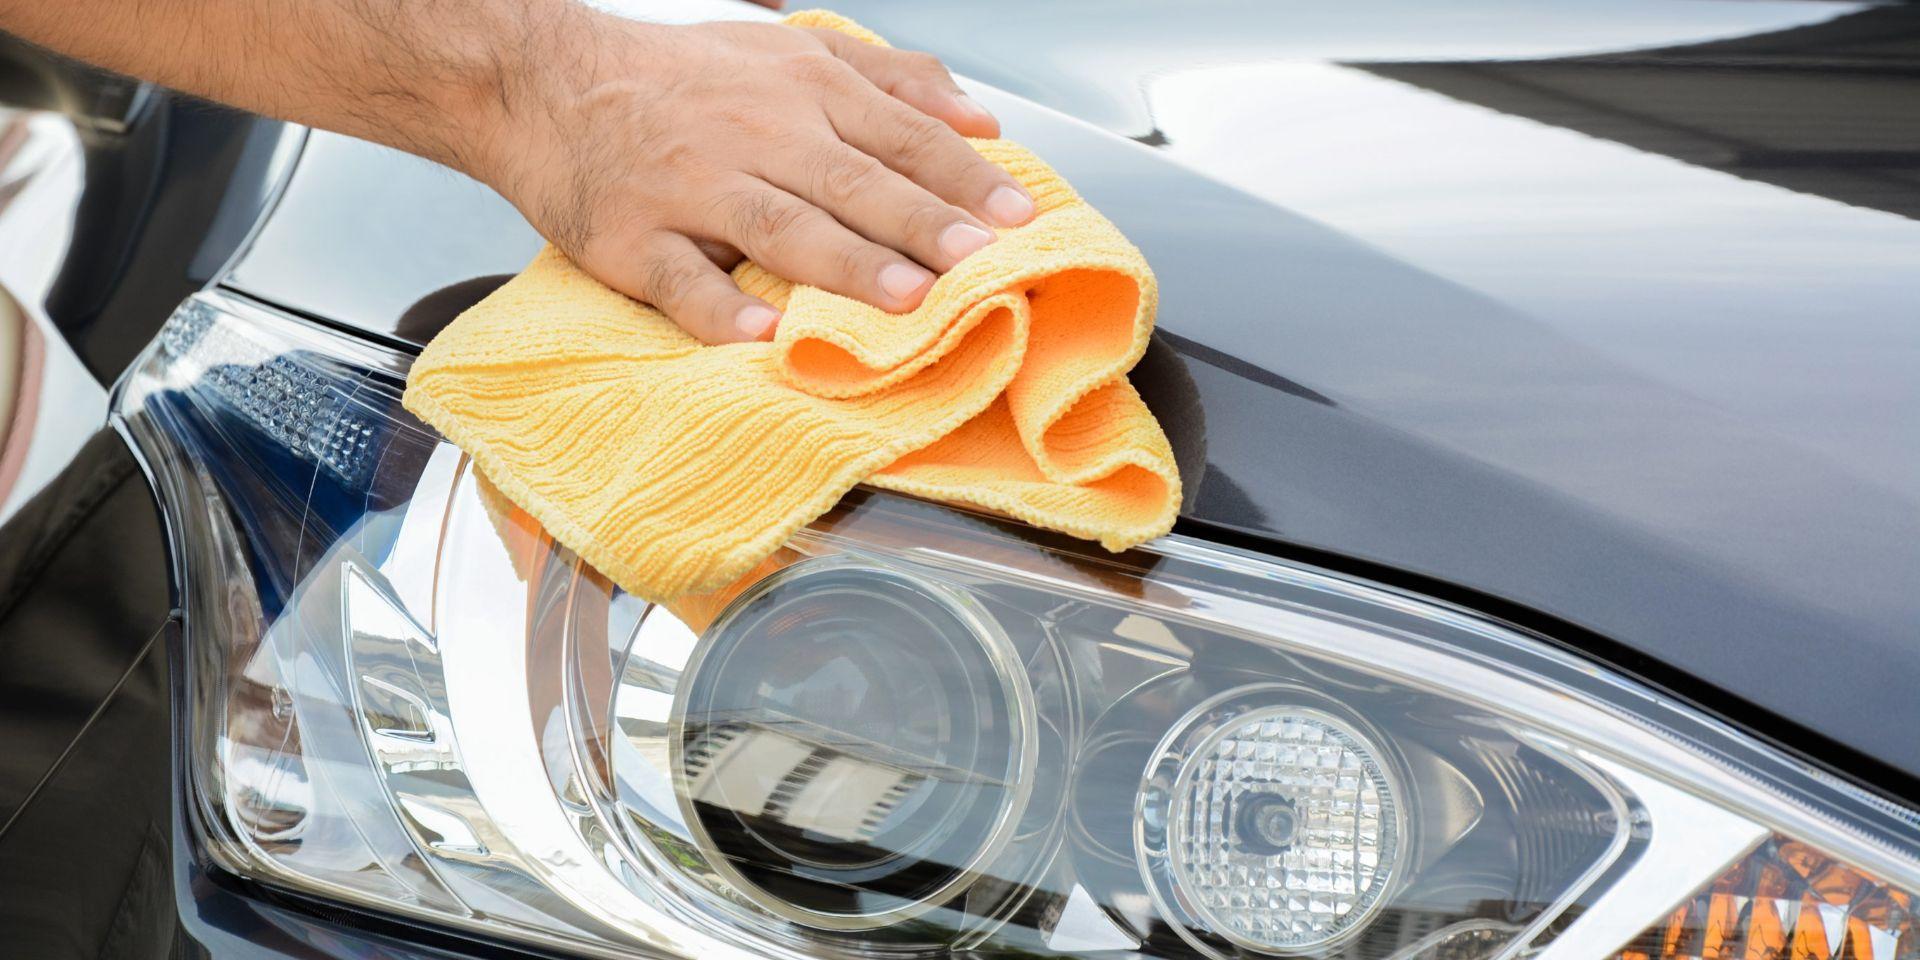 Not Waxing Puts Your Vehicle in Danger